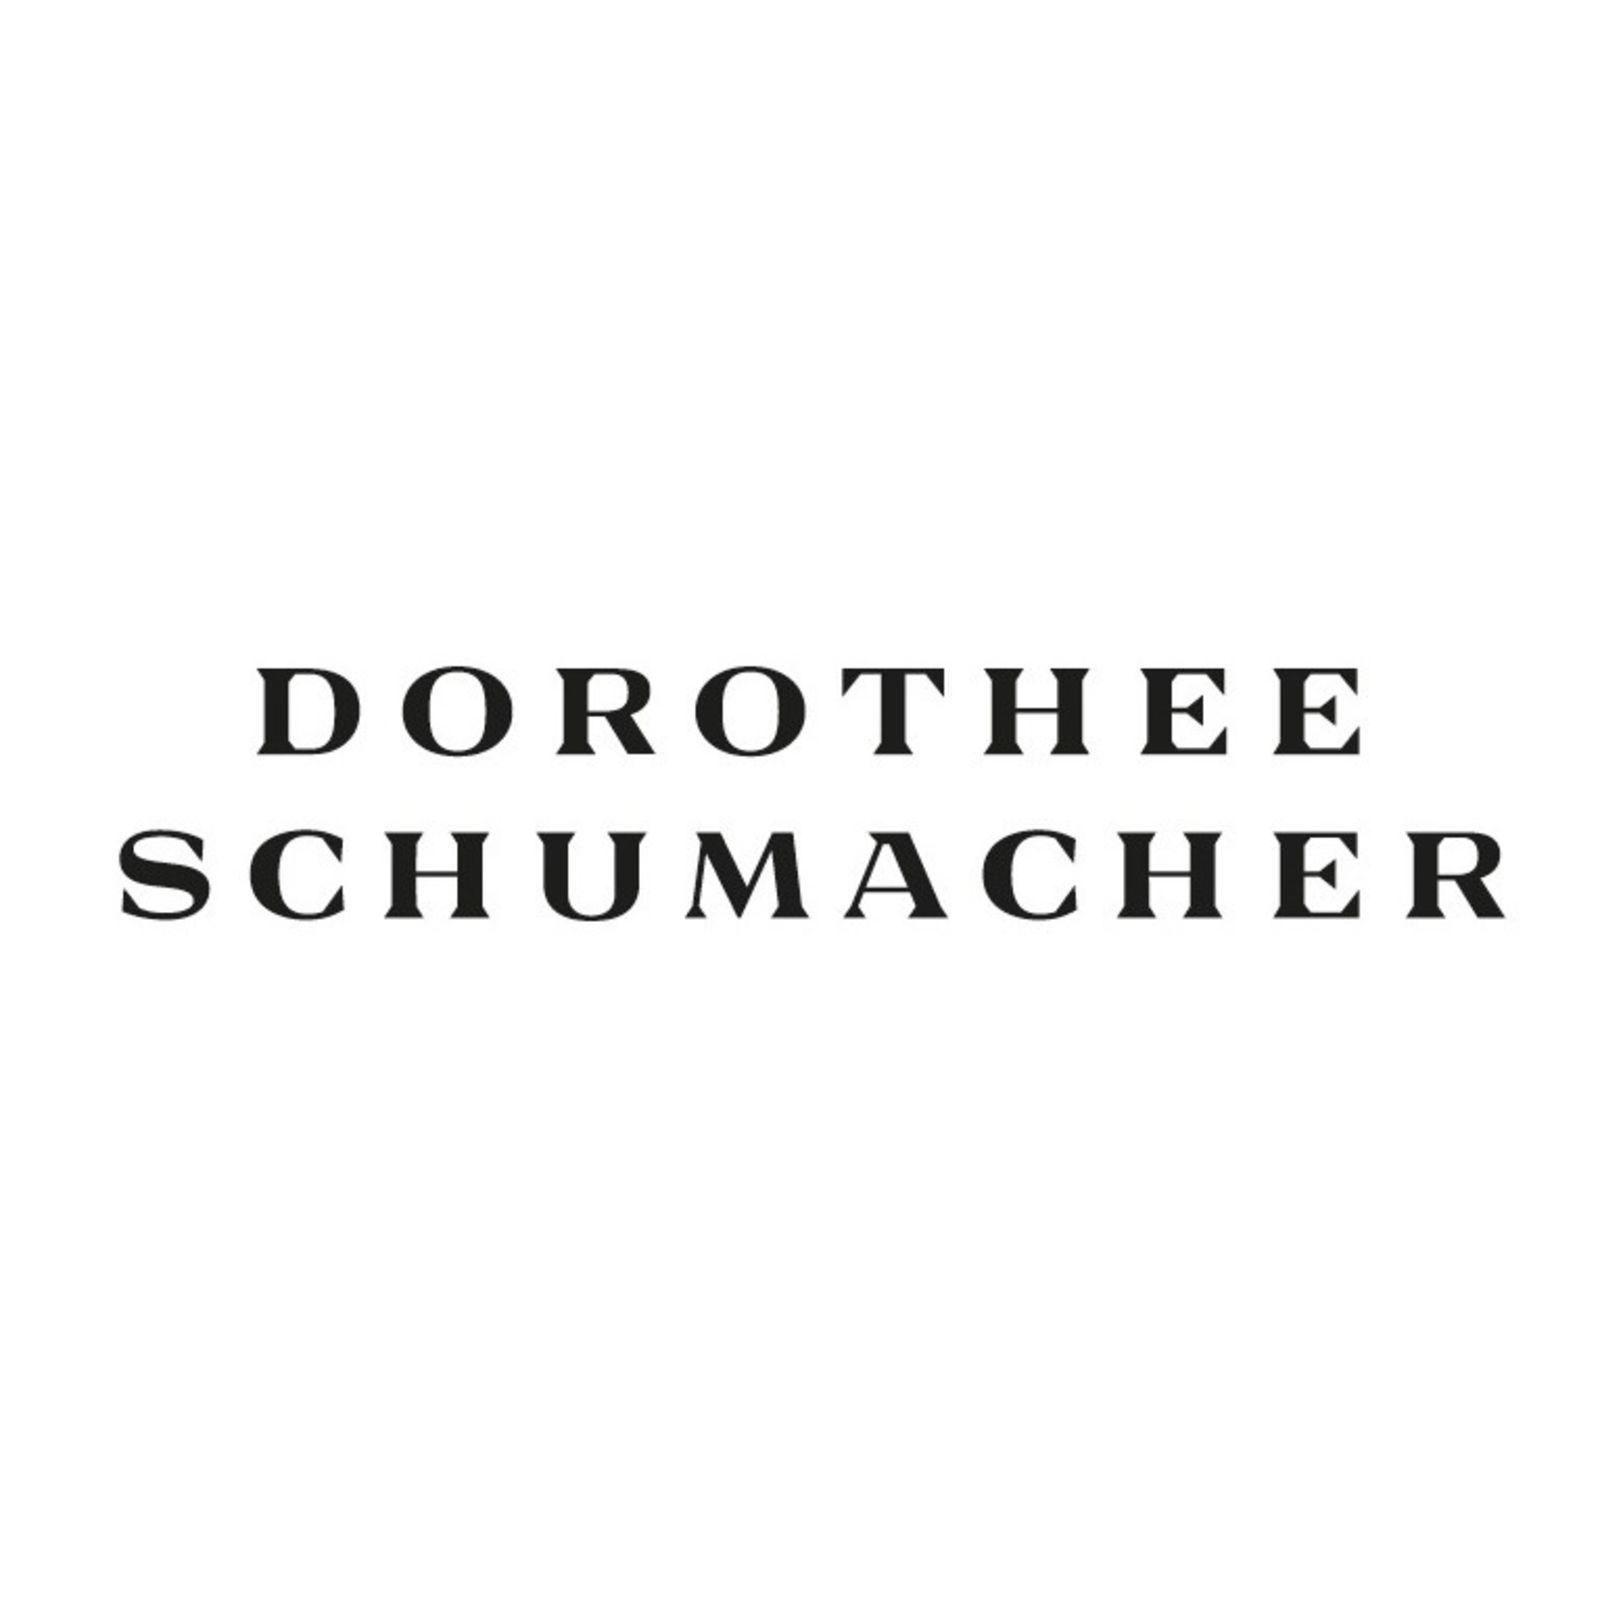 DOROTHEE SCHUMACHER (Image 1)